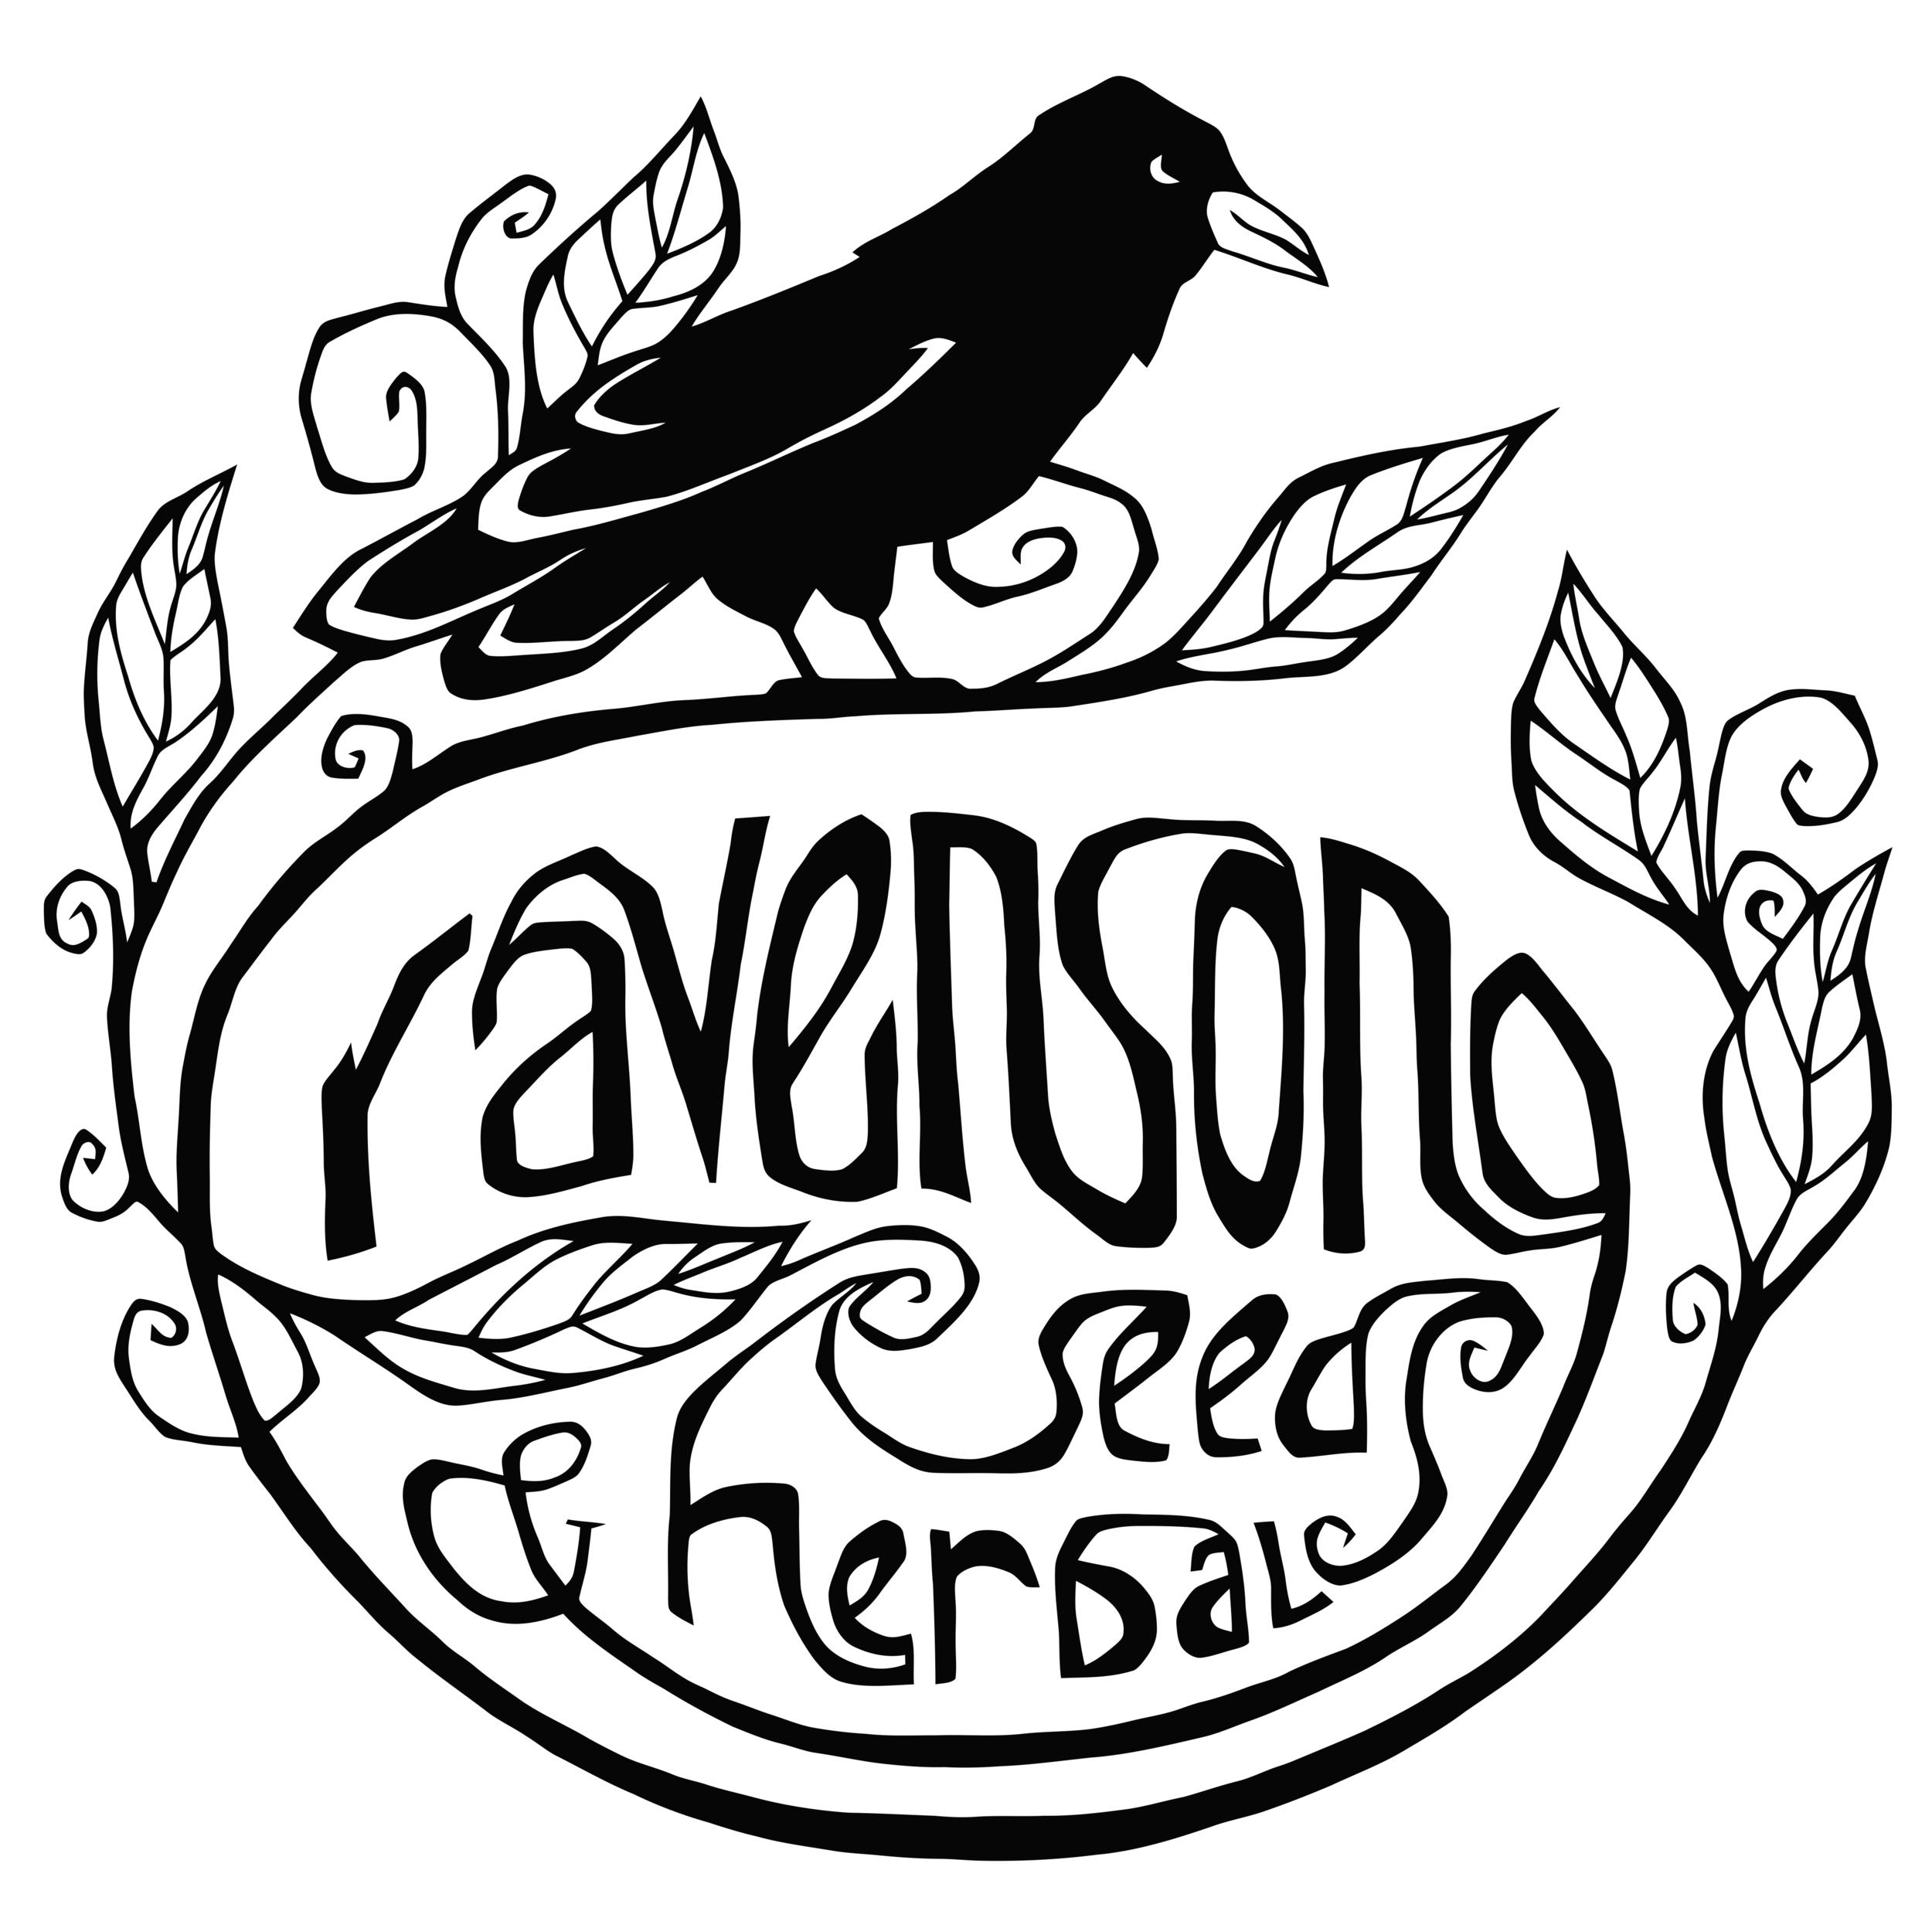 Ravensong Seeds & Herbals logo.png